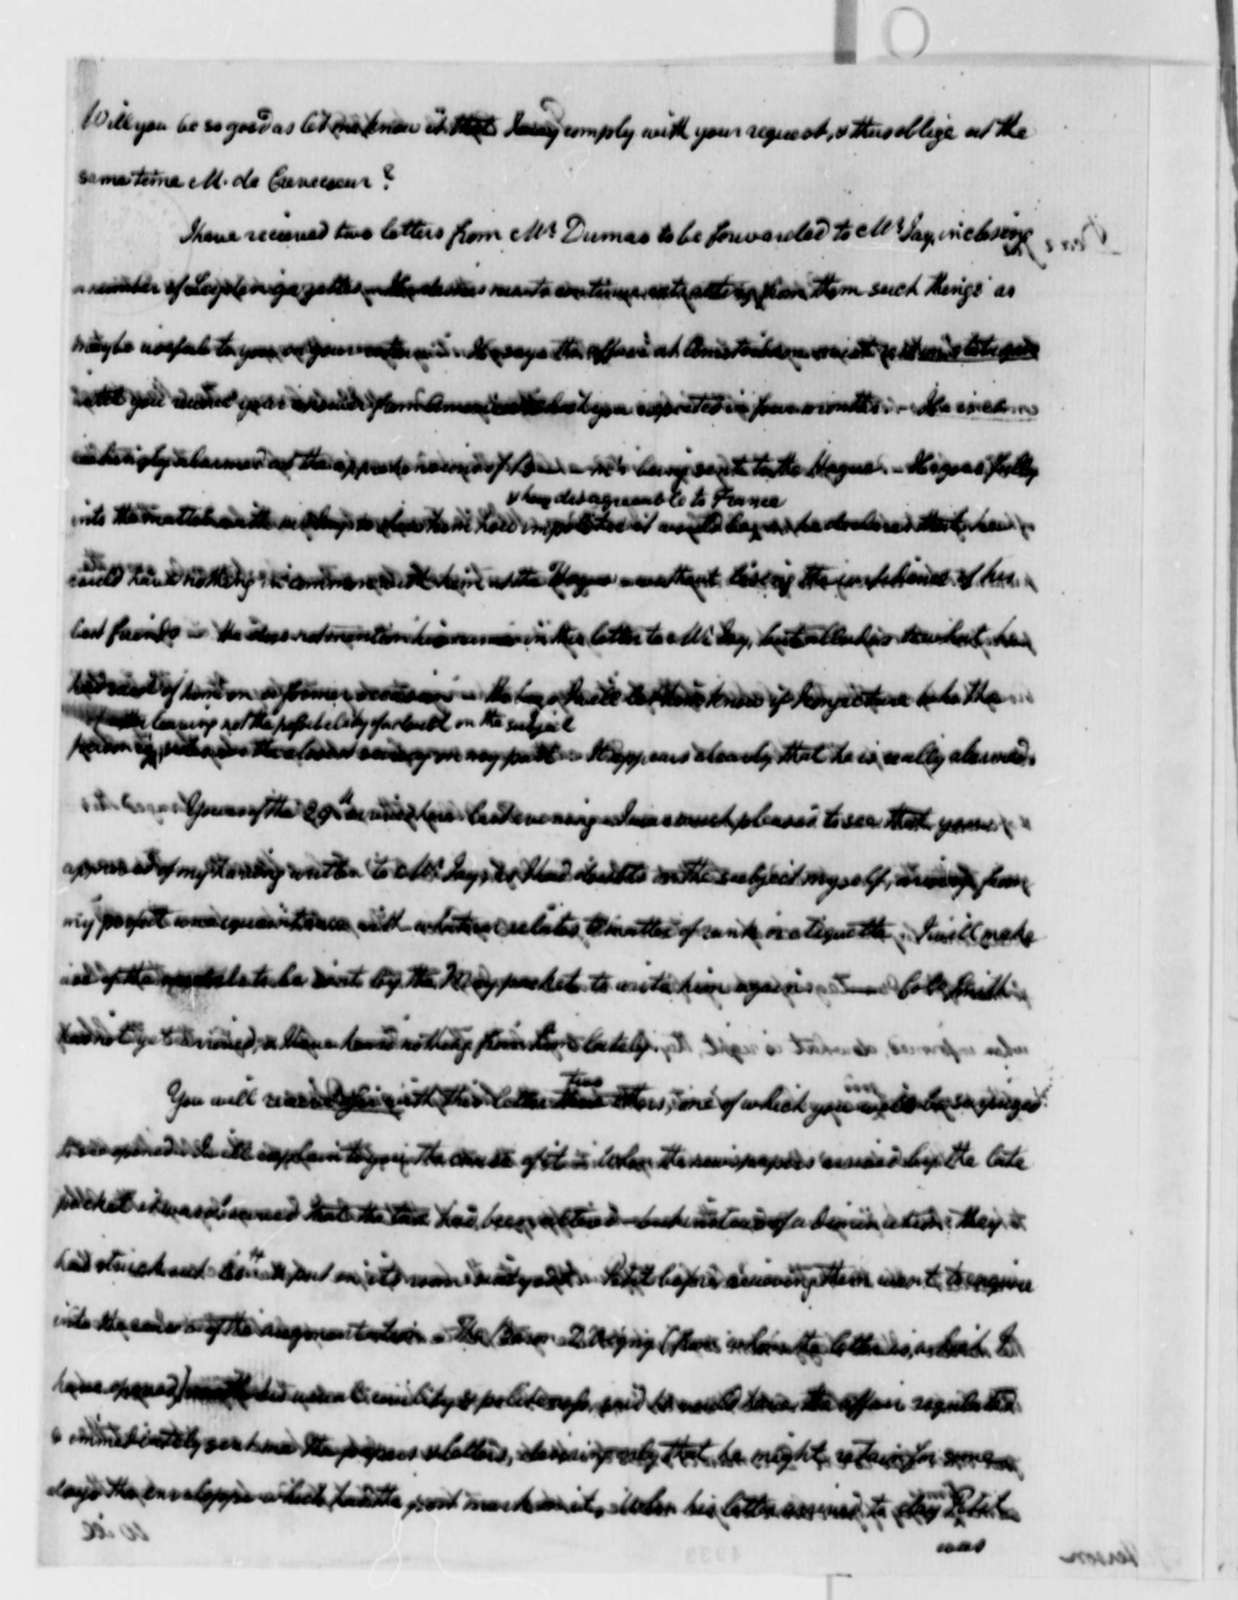 William Short to Thomas Jefferson, April 6, 1787